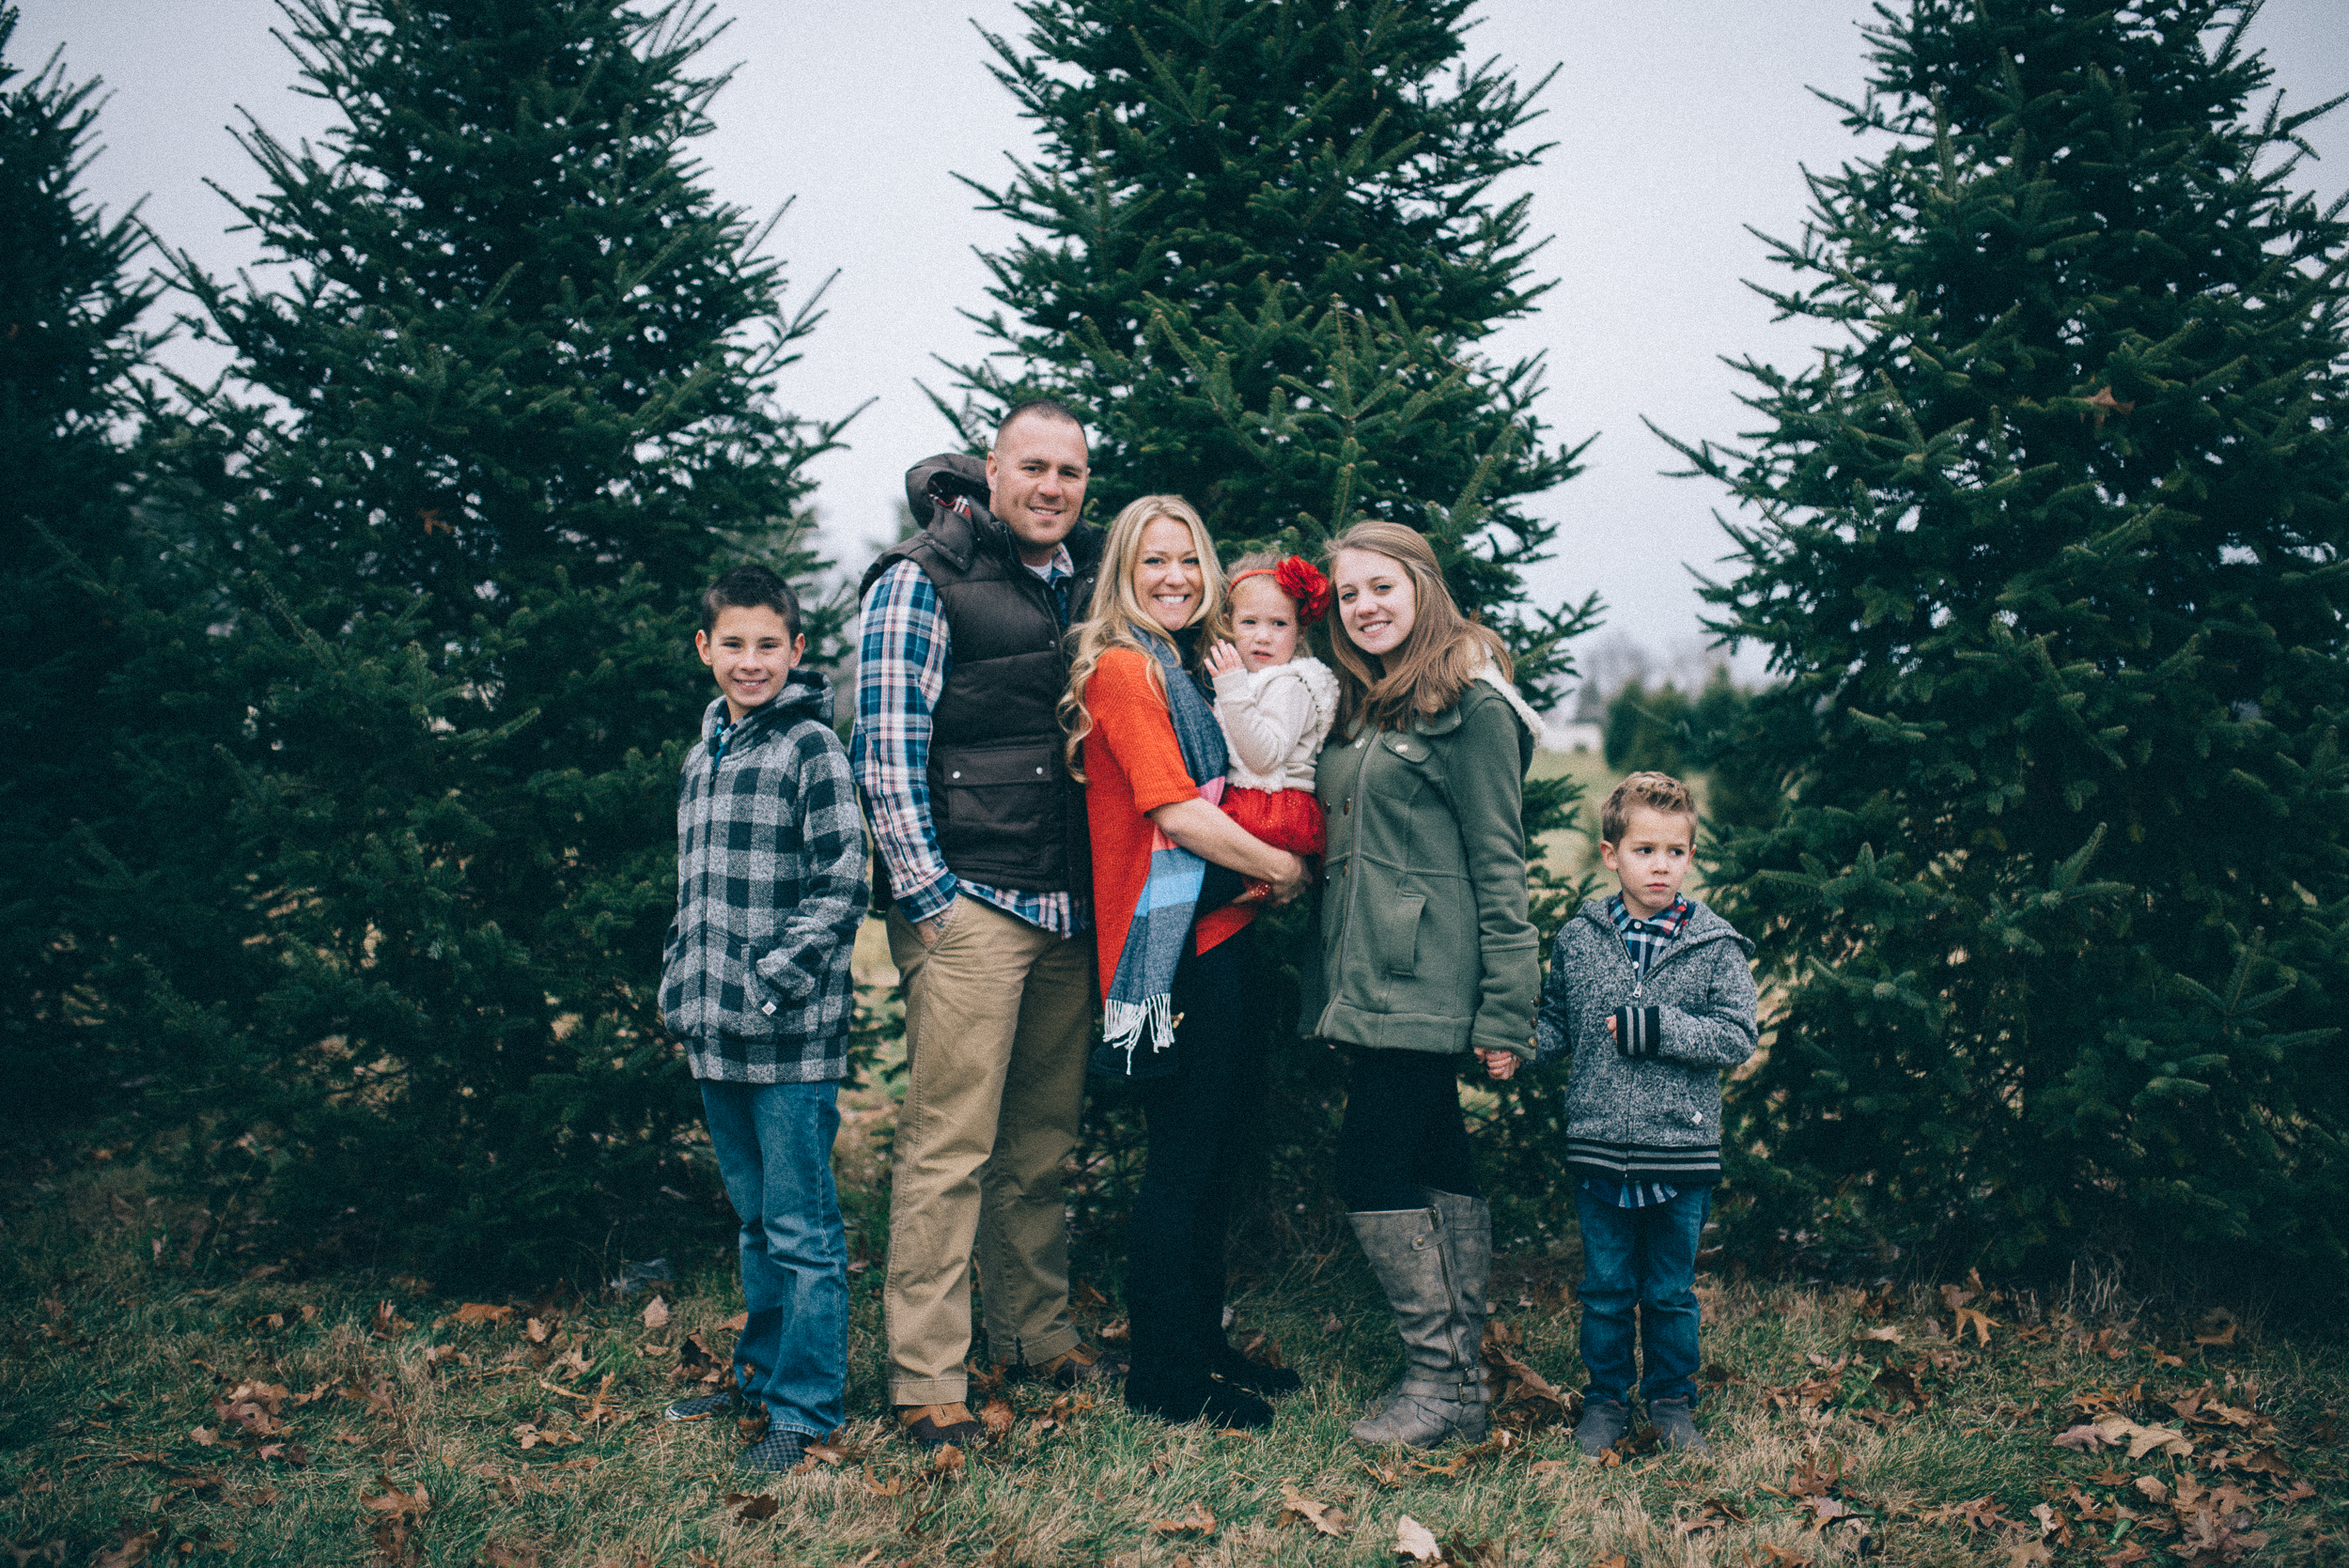 Adventure Family Experience  Philadelphia PA   Stephanie Barone